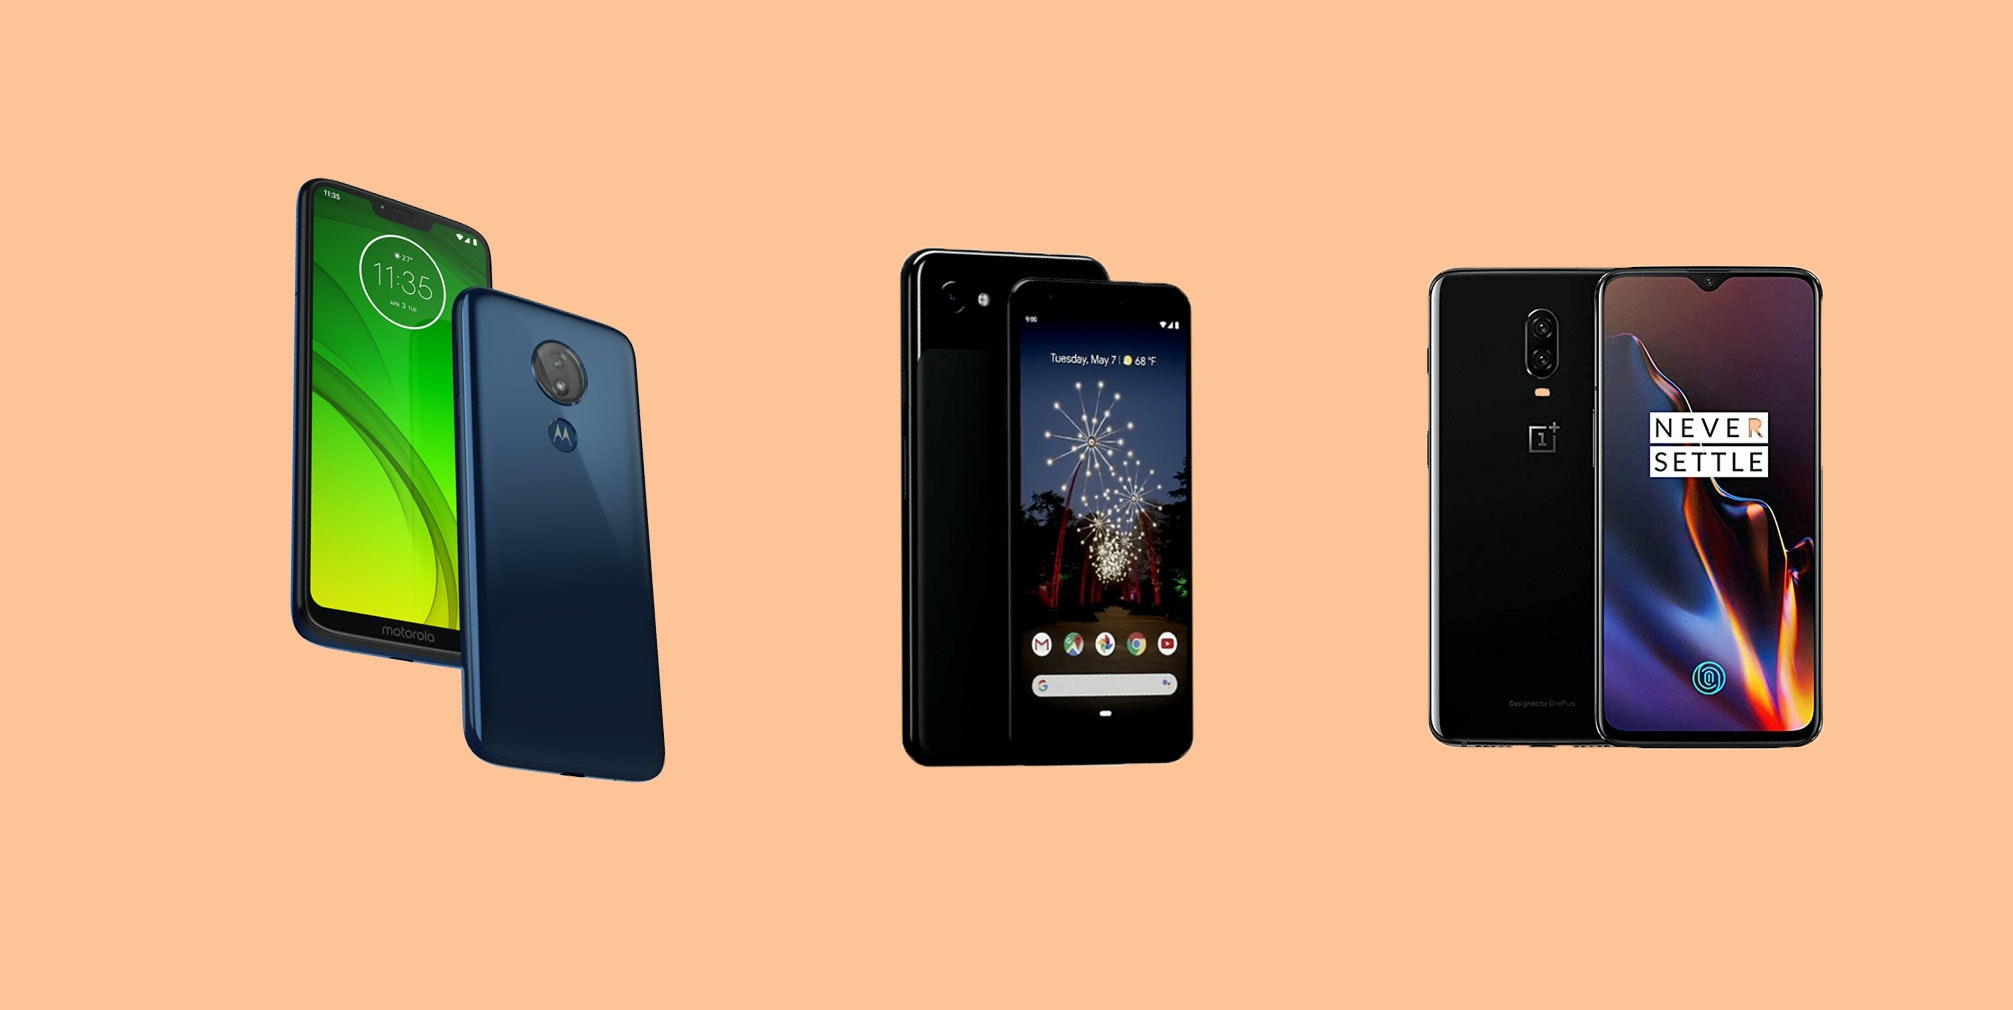 Pixel 3a vs Moto G7 Power: Best Budget Smartphones With Premium Features